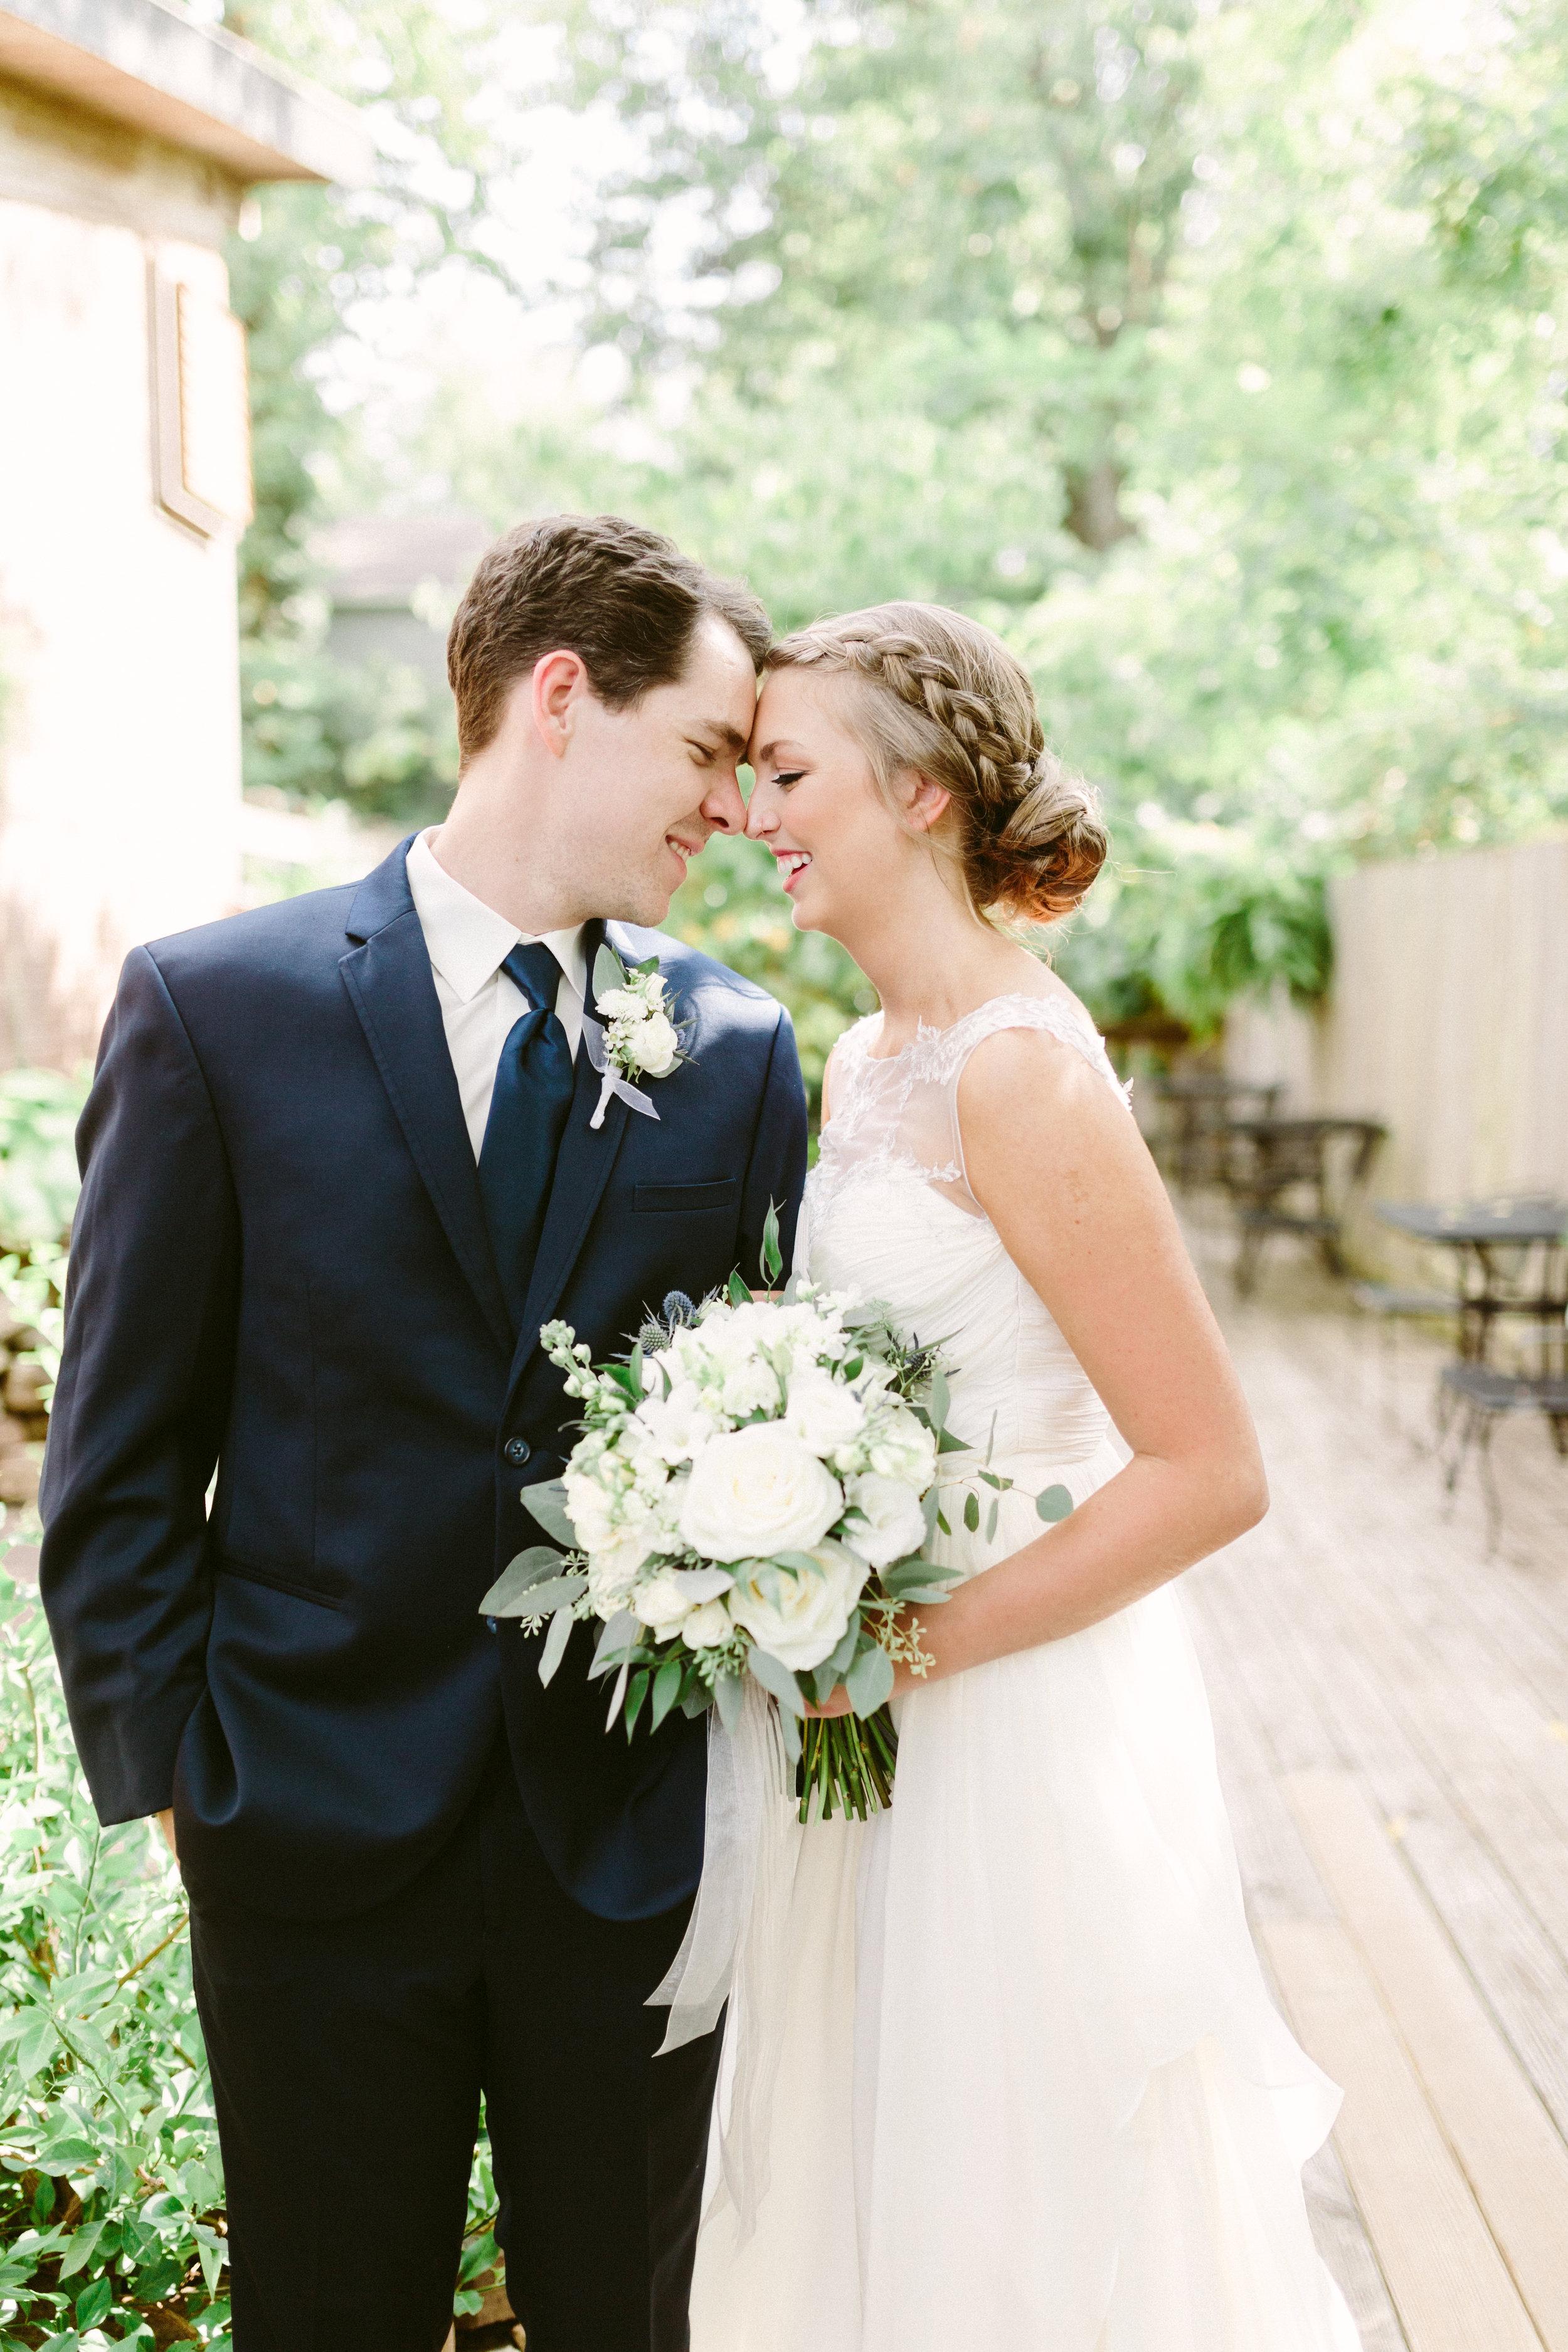 KatiMallory-Fayetteville Wedding Florist-2050.JPG